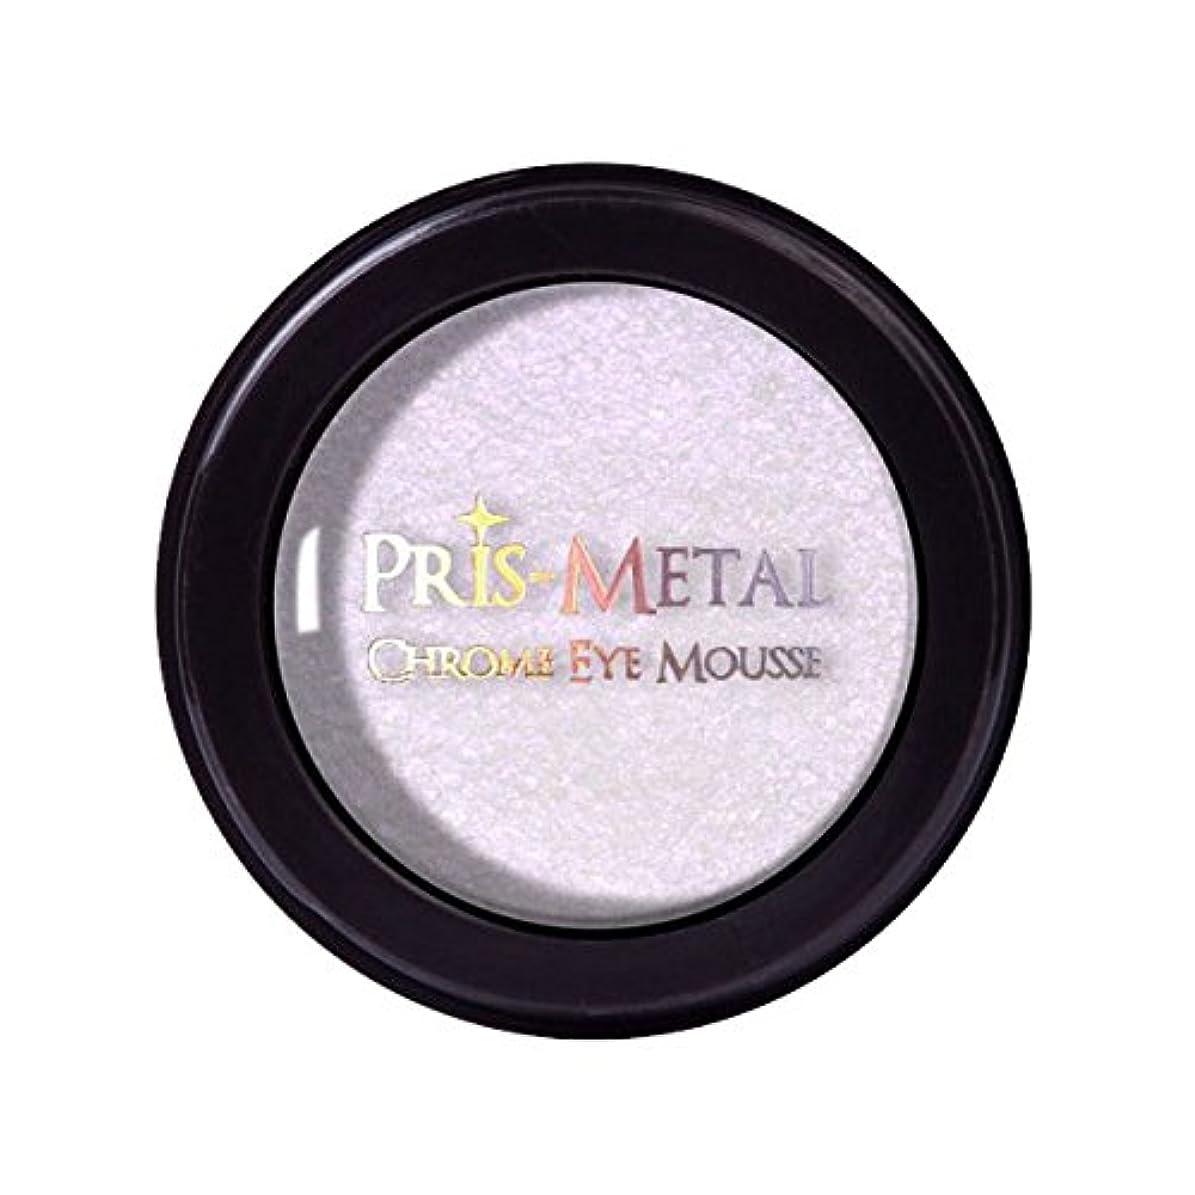 枯れる効果的永続(3 Pack) J. CAT BEAUTY Pris-Metal Chrome Eye Mousse - Pinky Promise (並行輸入品)